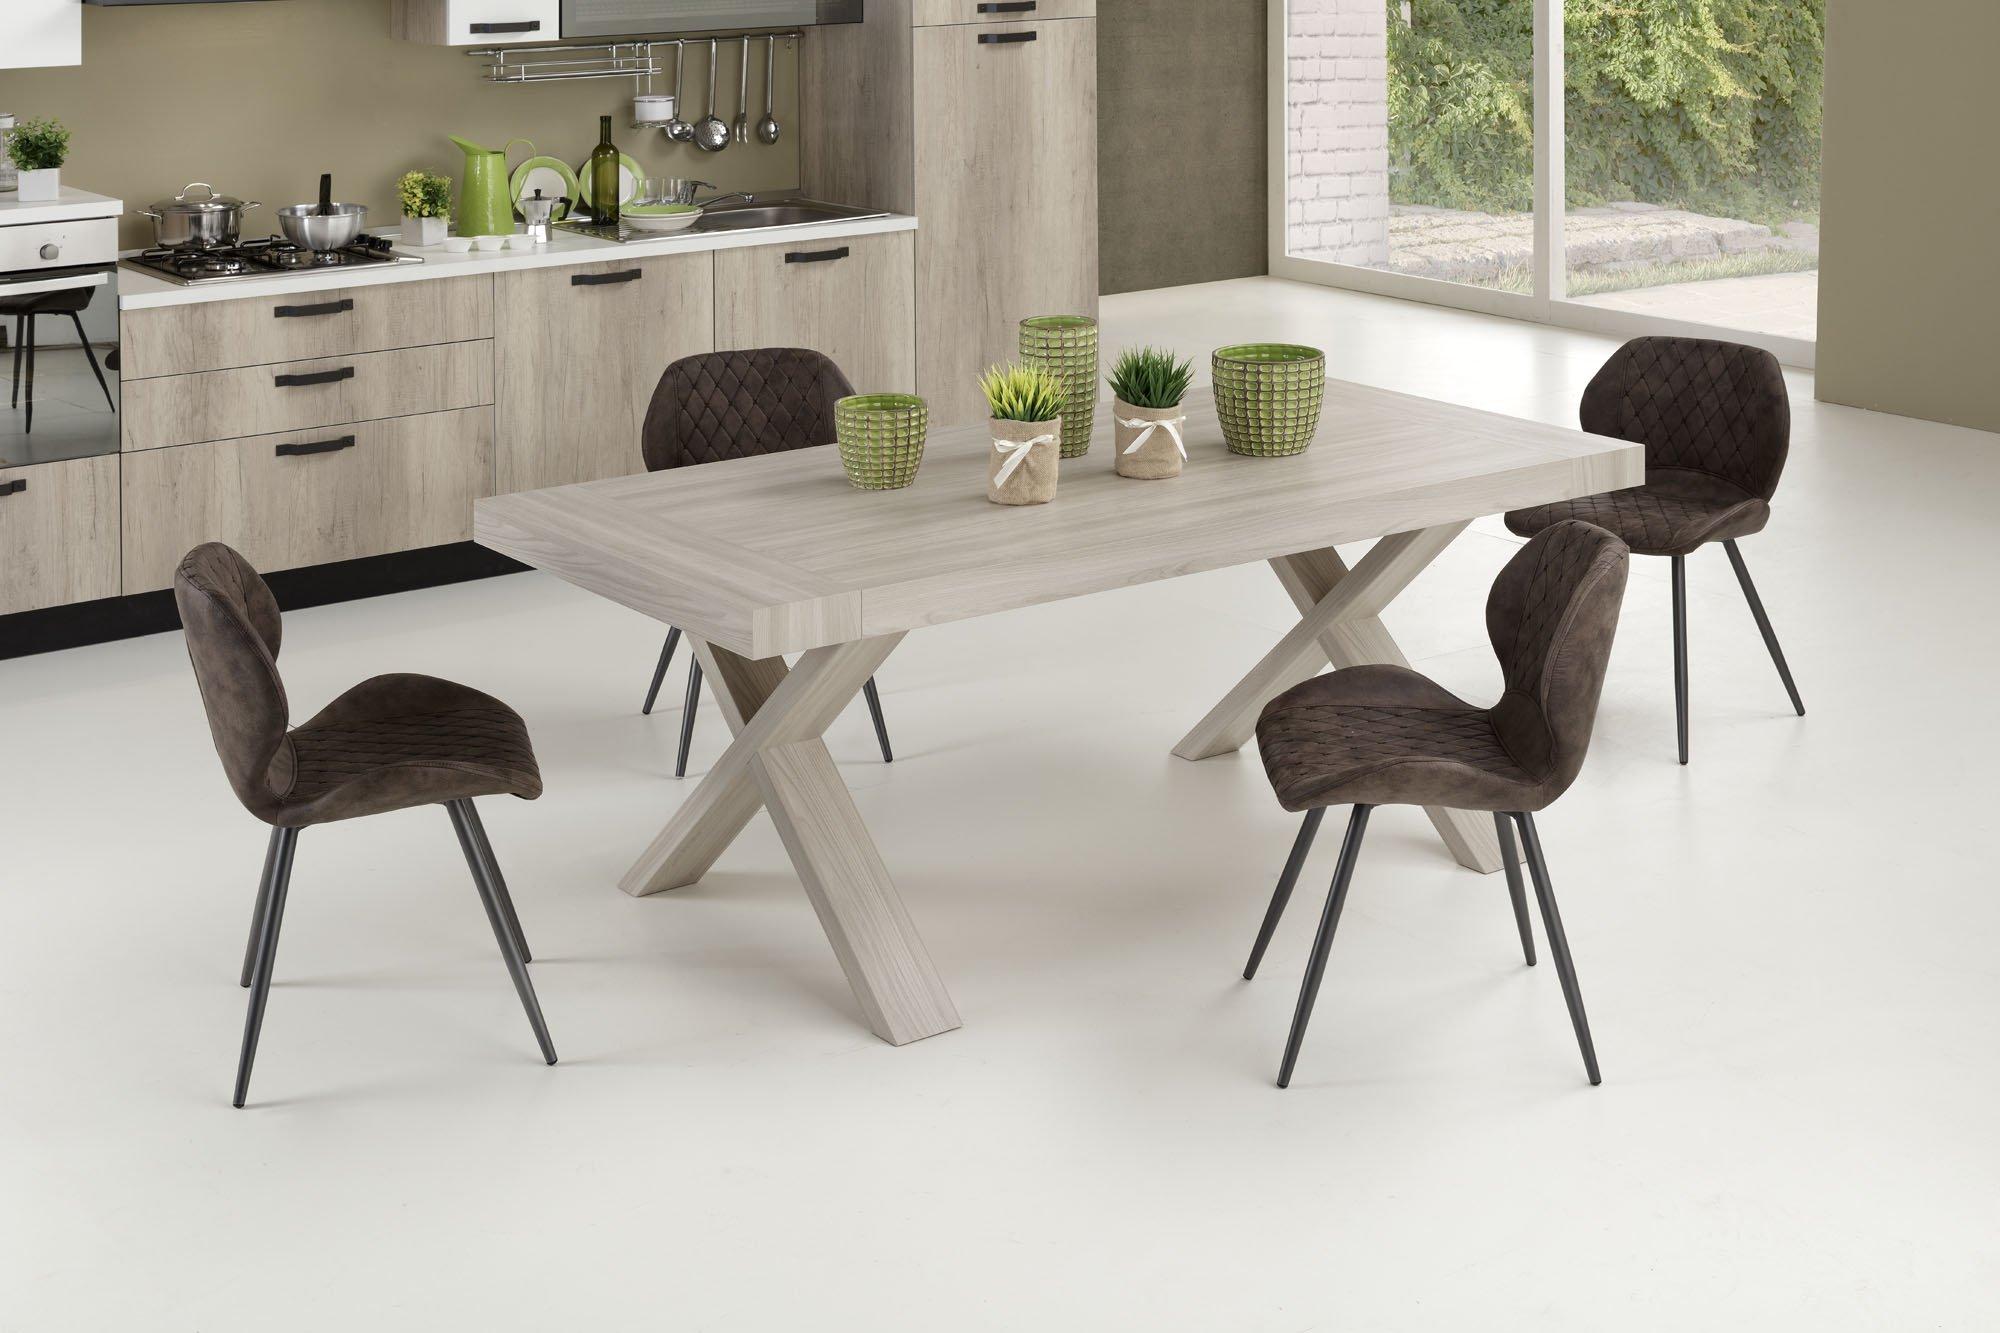 Capri grand arredo mobili - Deco mobili tavoli e sedie ...